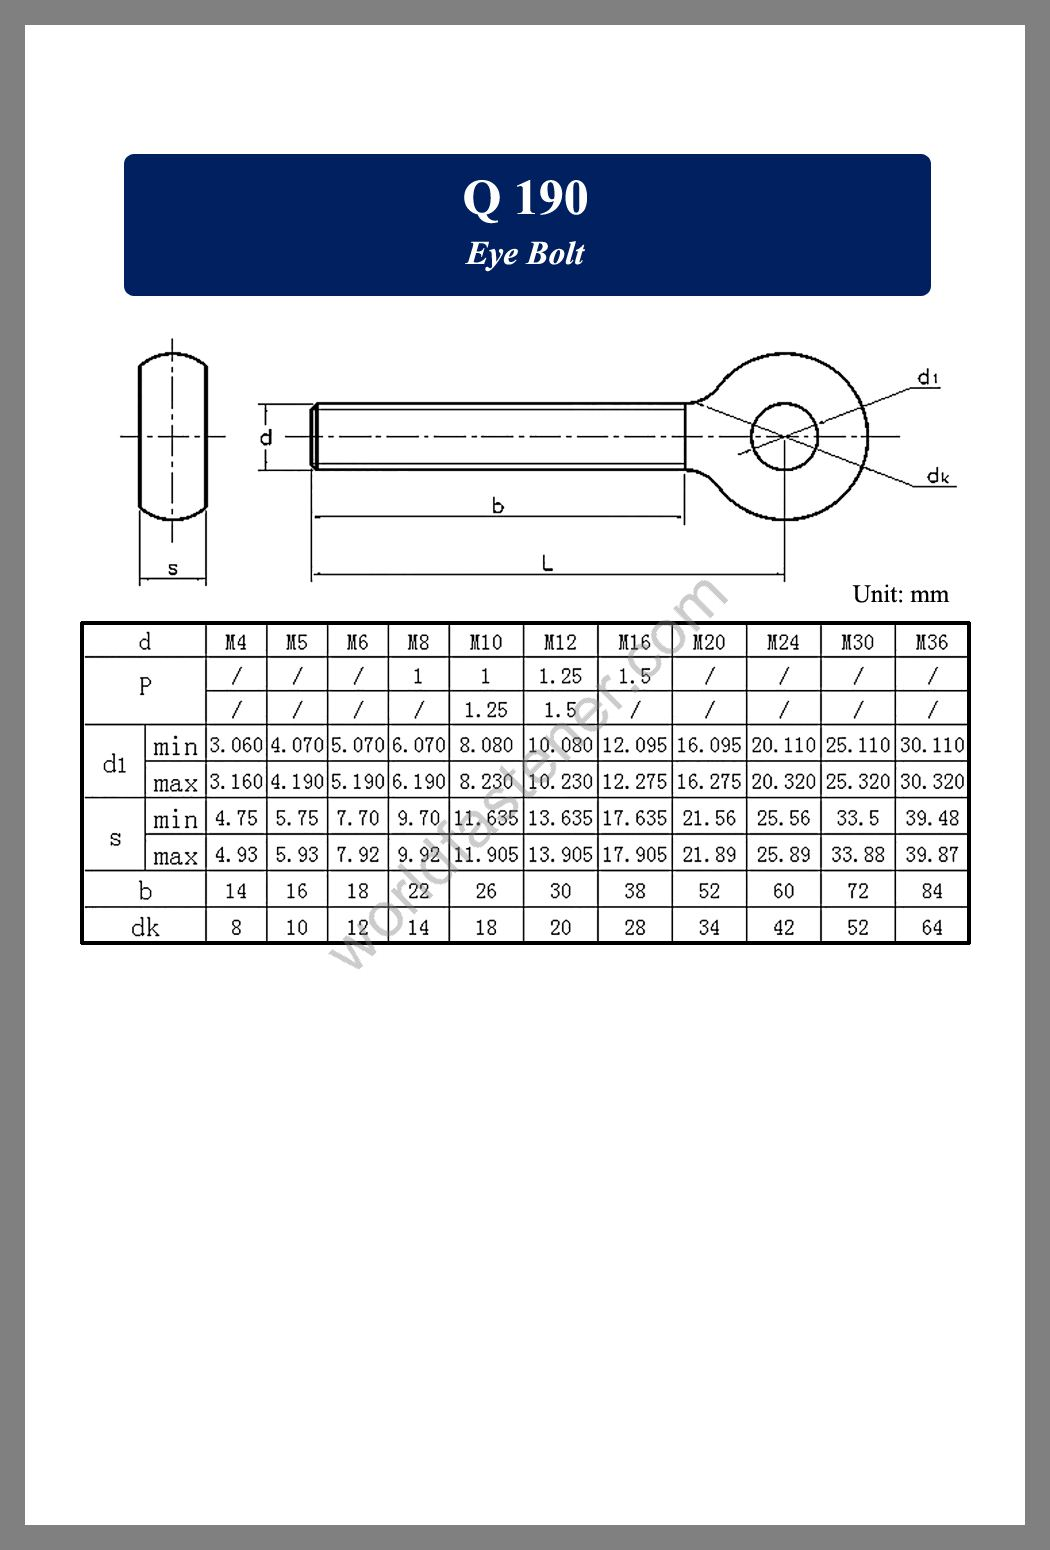 Q 190 Eye Bolt, Eye Bolts, fastener, screw, bolt, Q standard bolts, Q standard screws